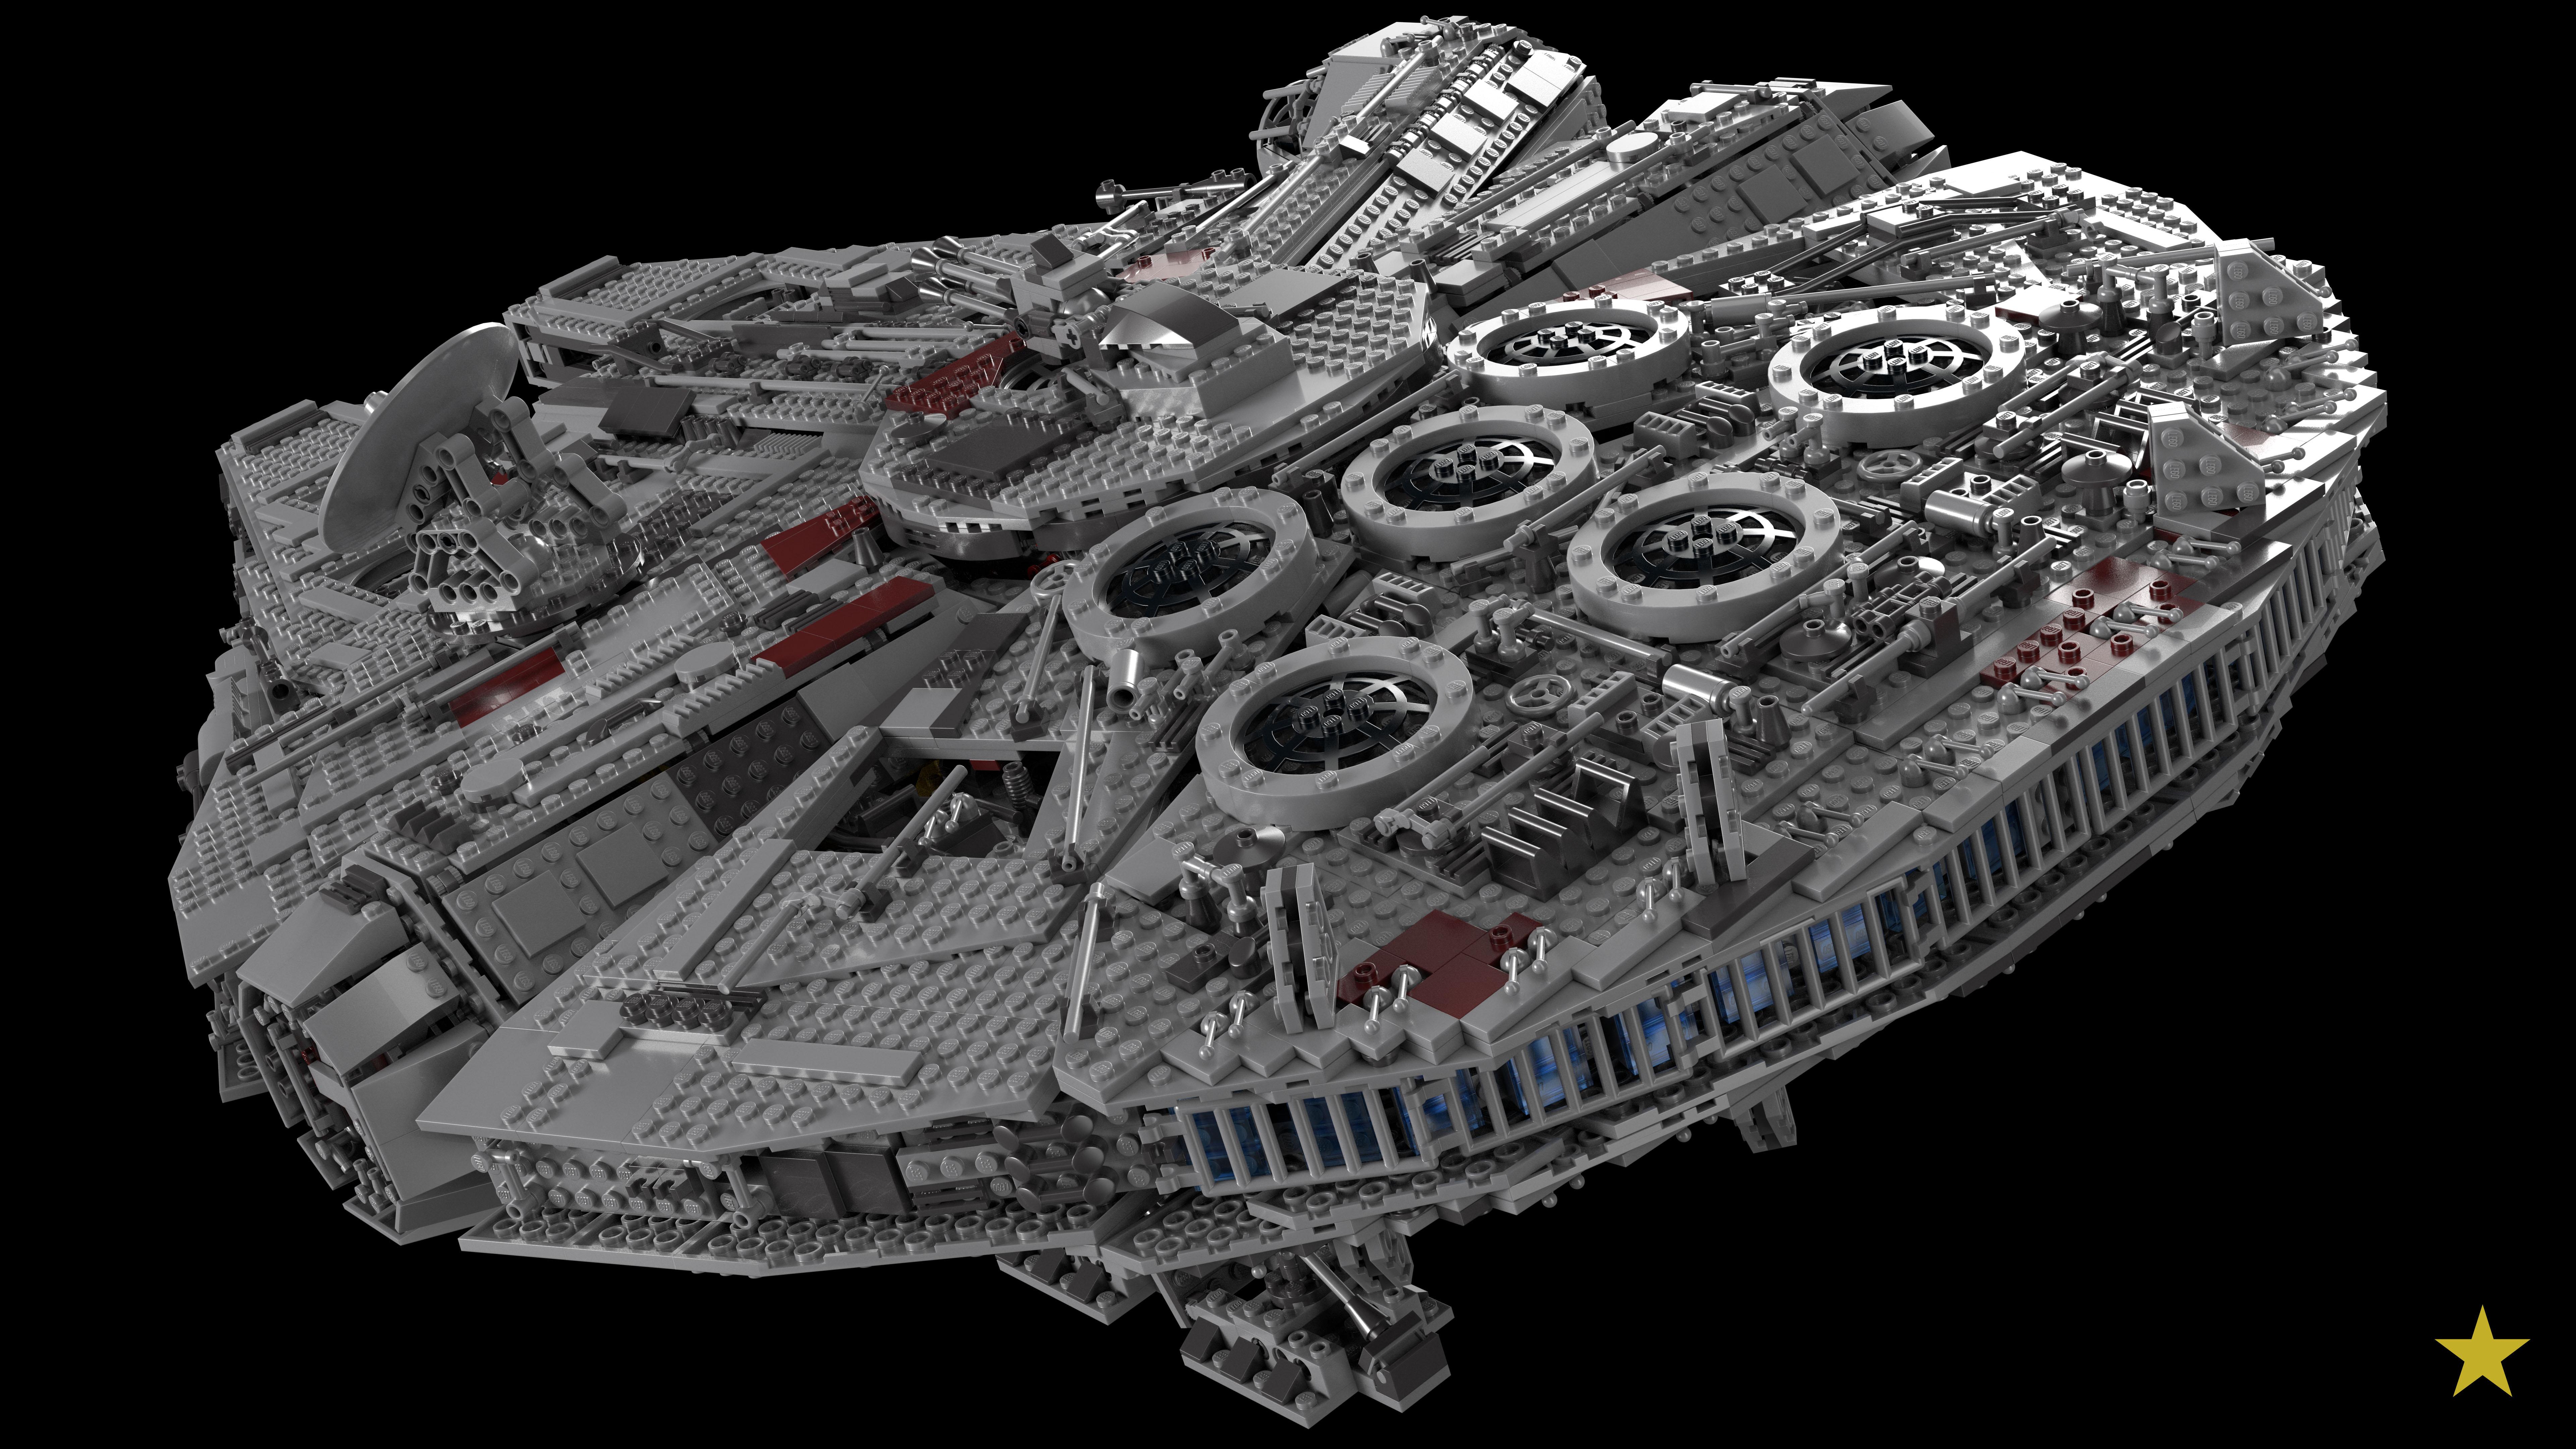 [Image: 10179_Millennium_Falcon_UCS_v03_Back_8K.jpg]